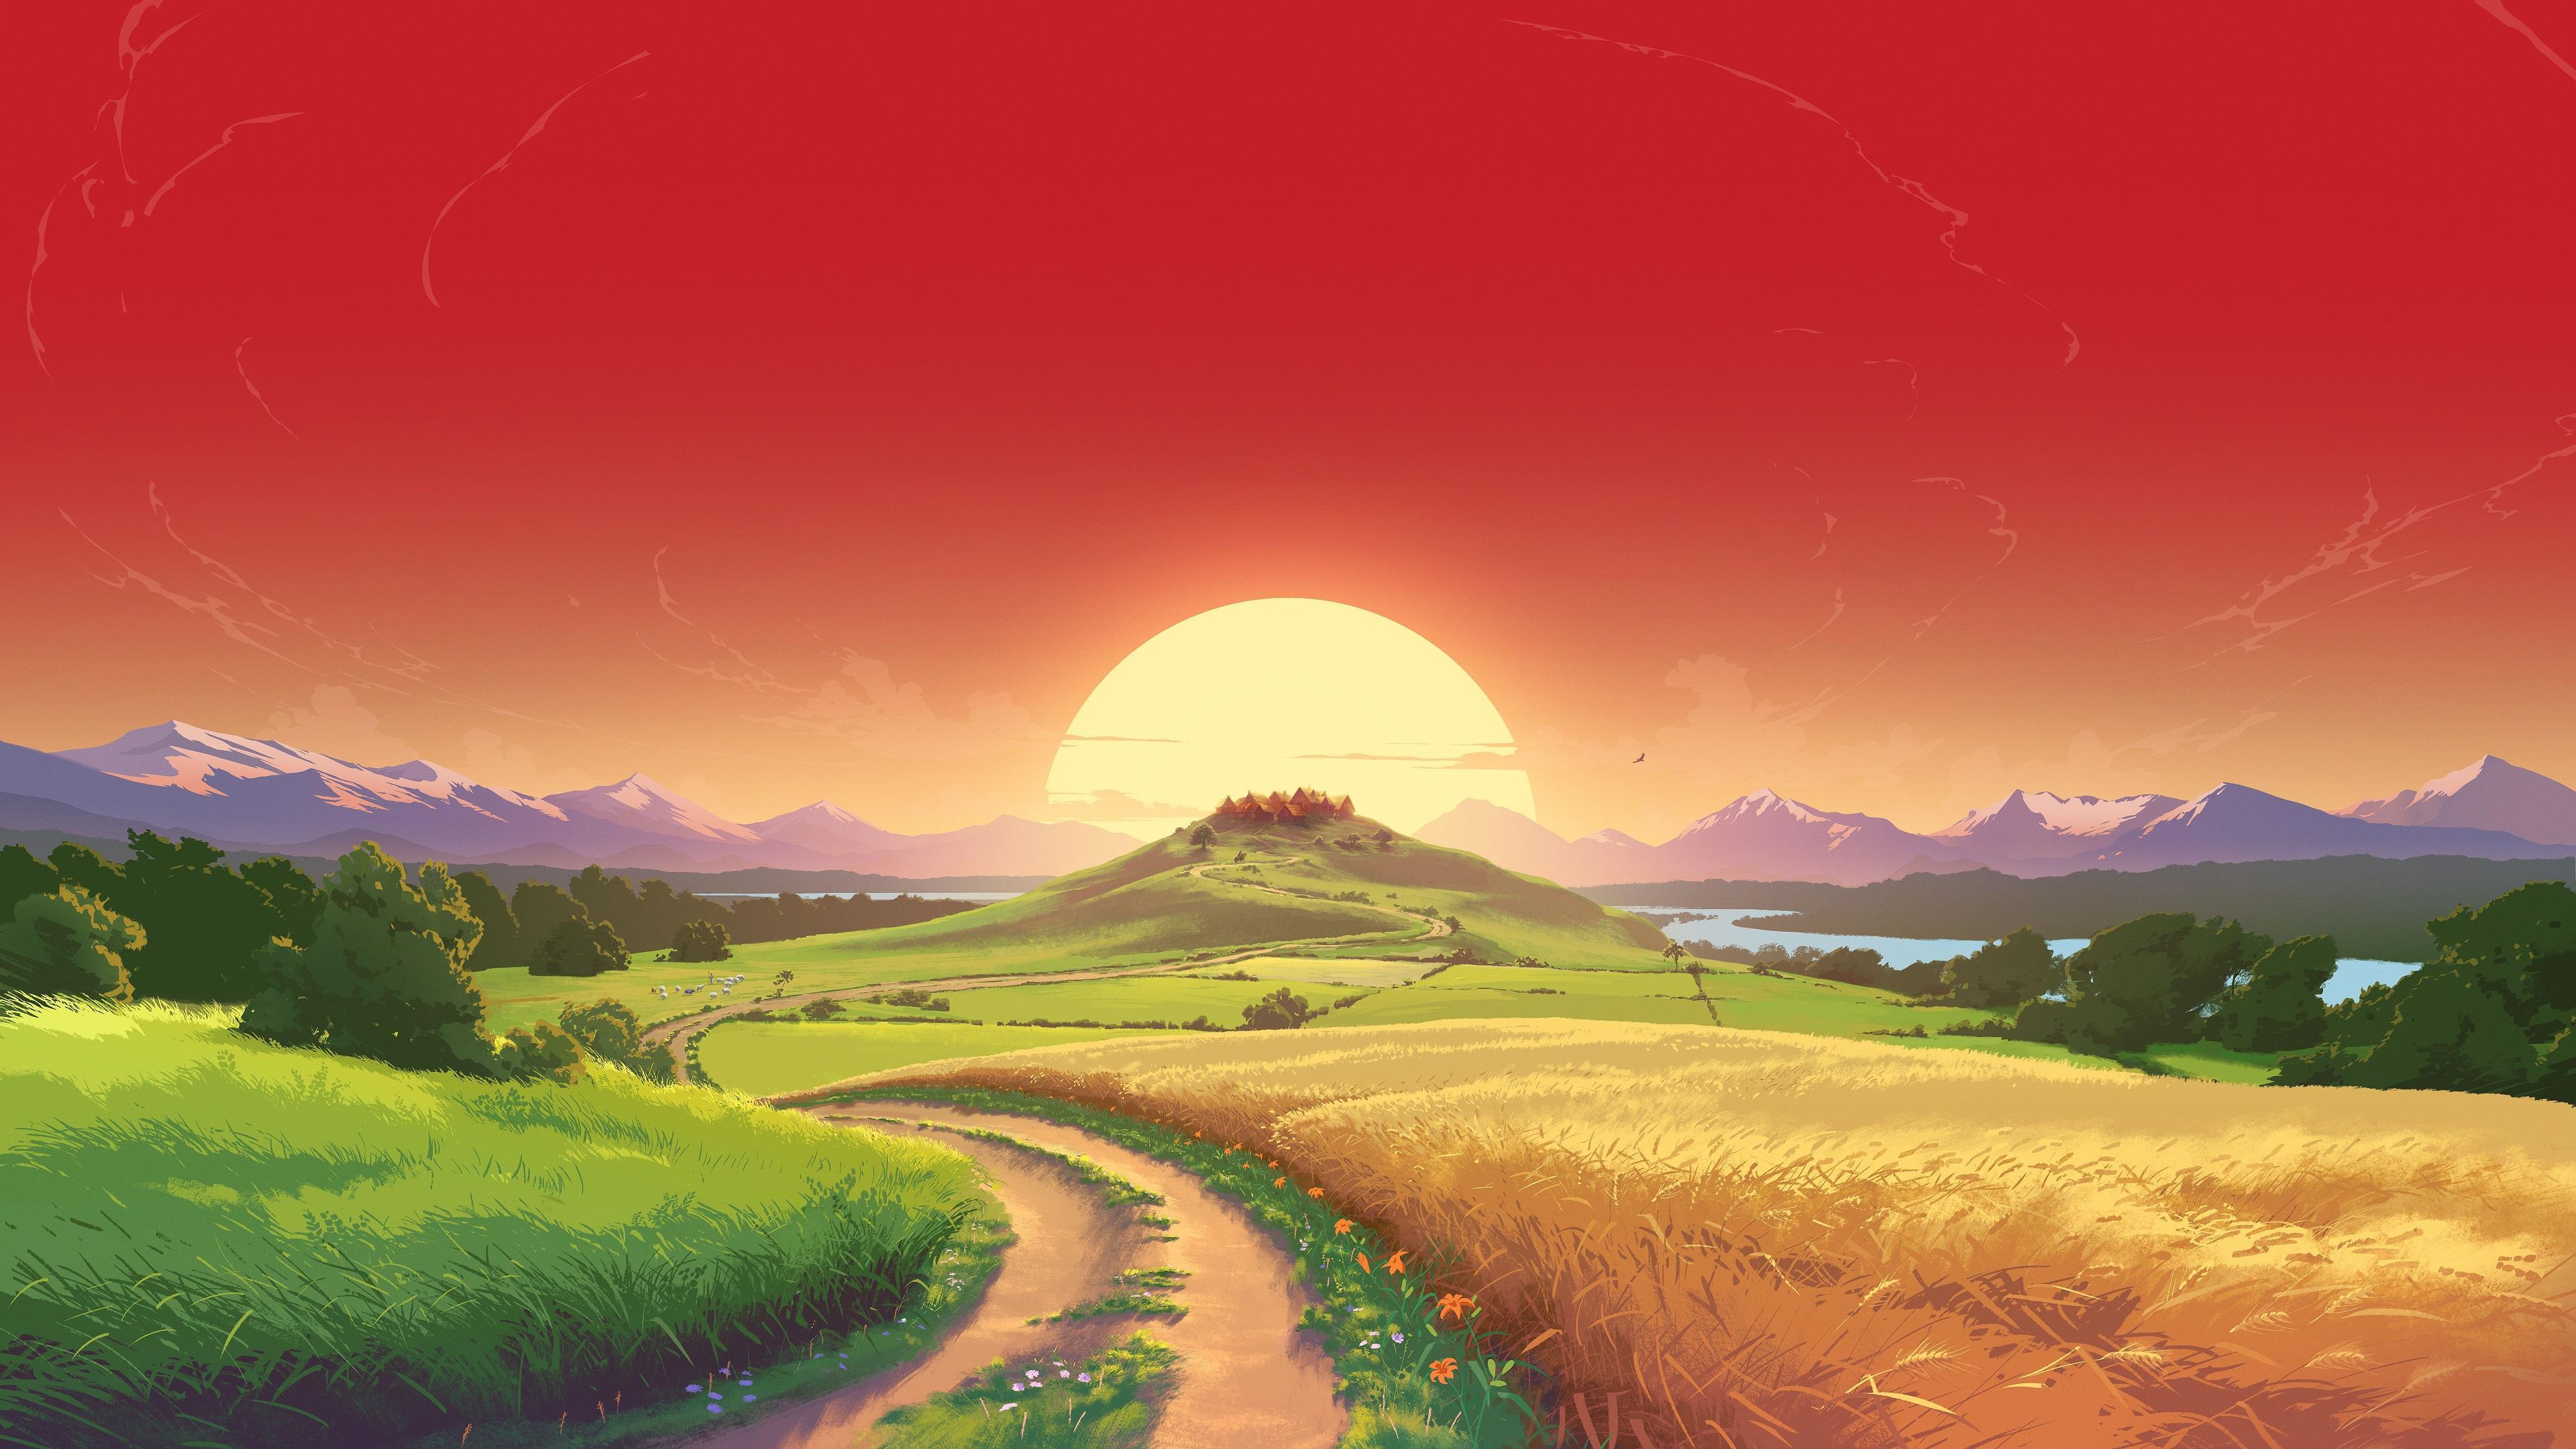 Nature Background 4k 2560x1440 Download Hd Wallpaper Wallpapertip